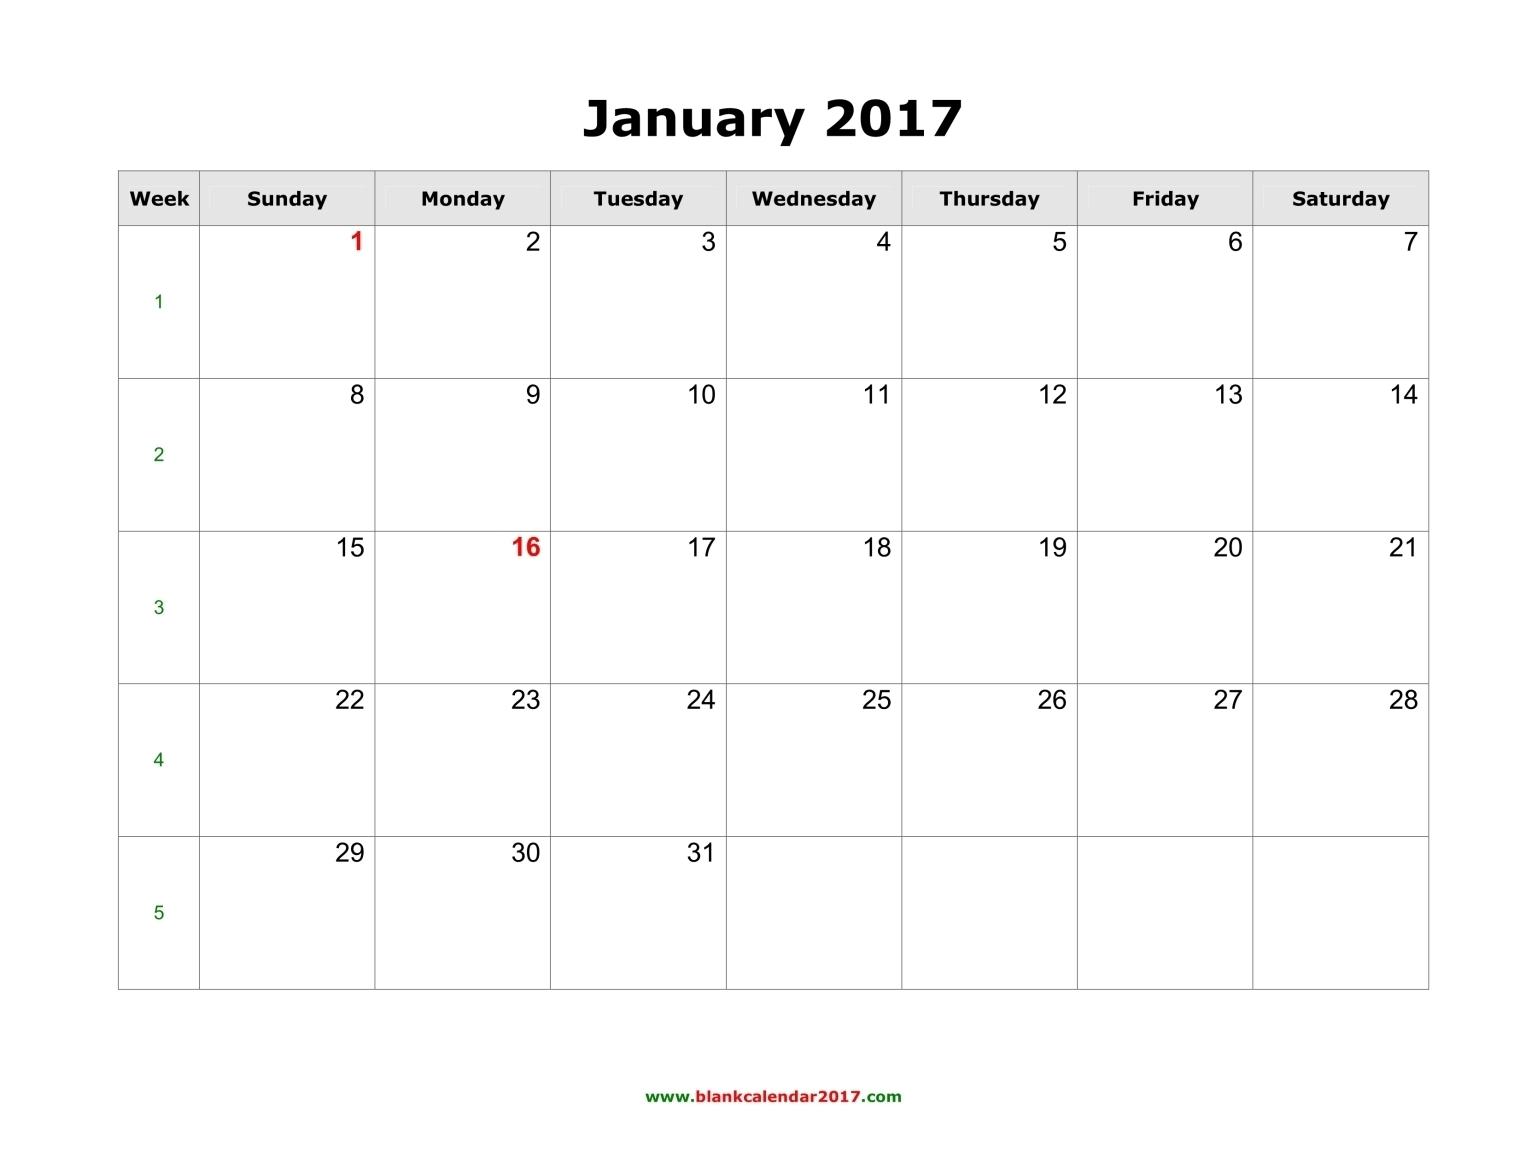 2017 Monthly Calendar Template 2017 Calendar With Holidays  Xjb